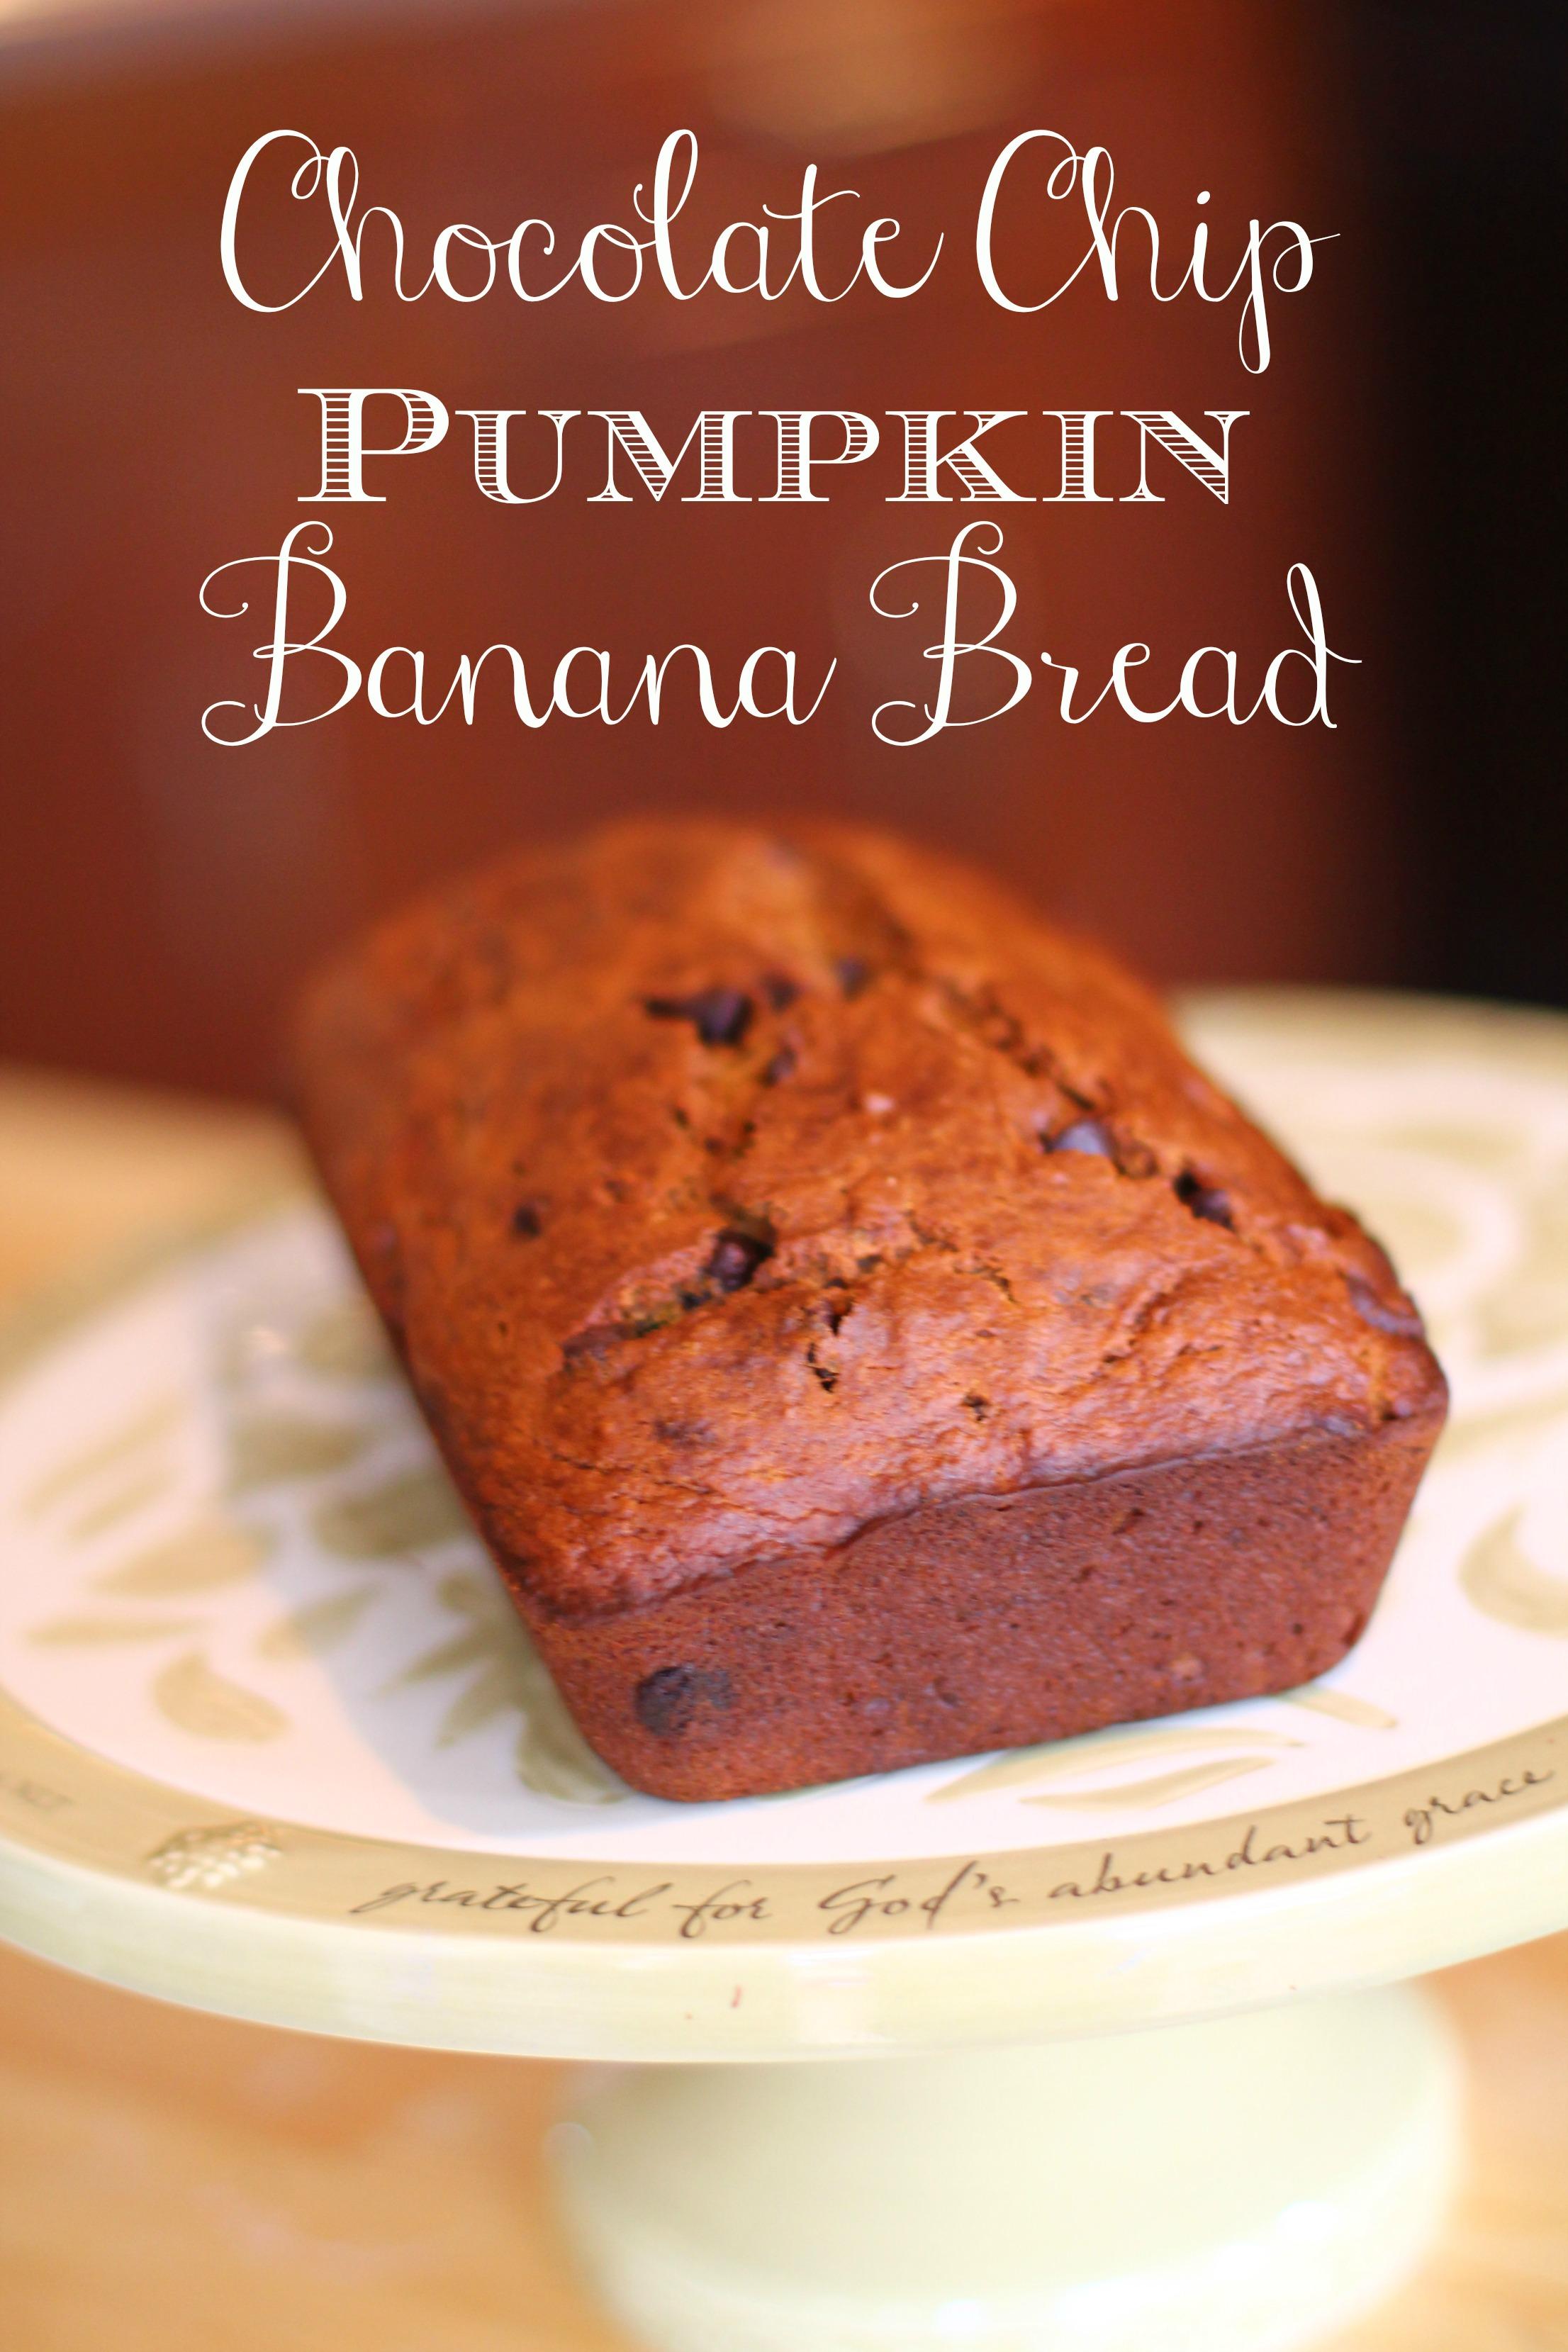 Easy Chocolate Chip Pumpkin Banana Bread — The Mom Creative